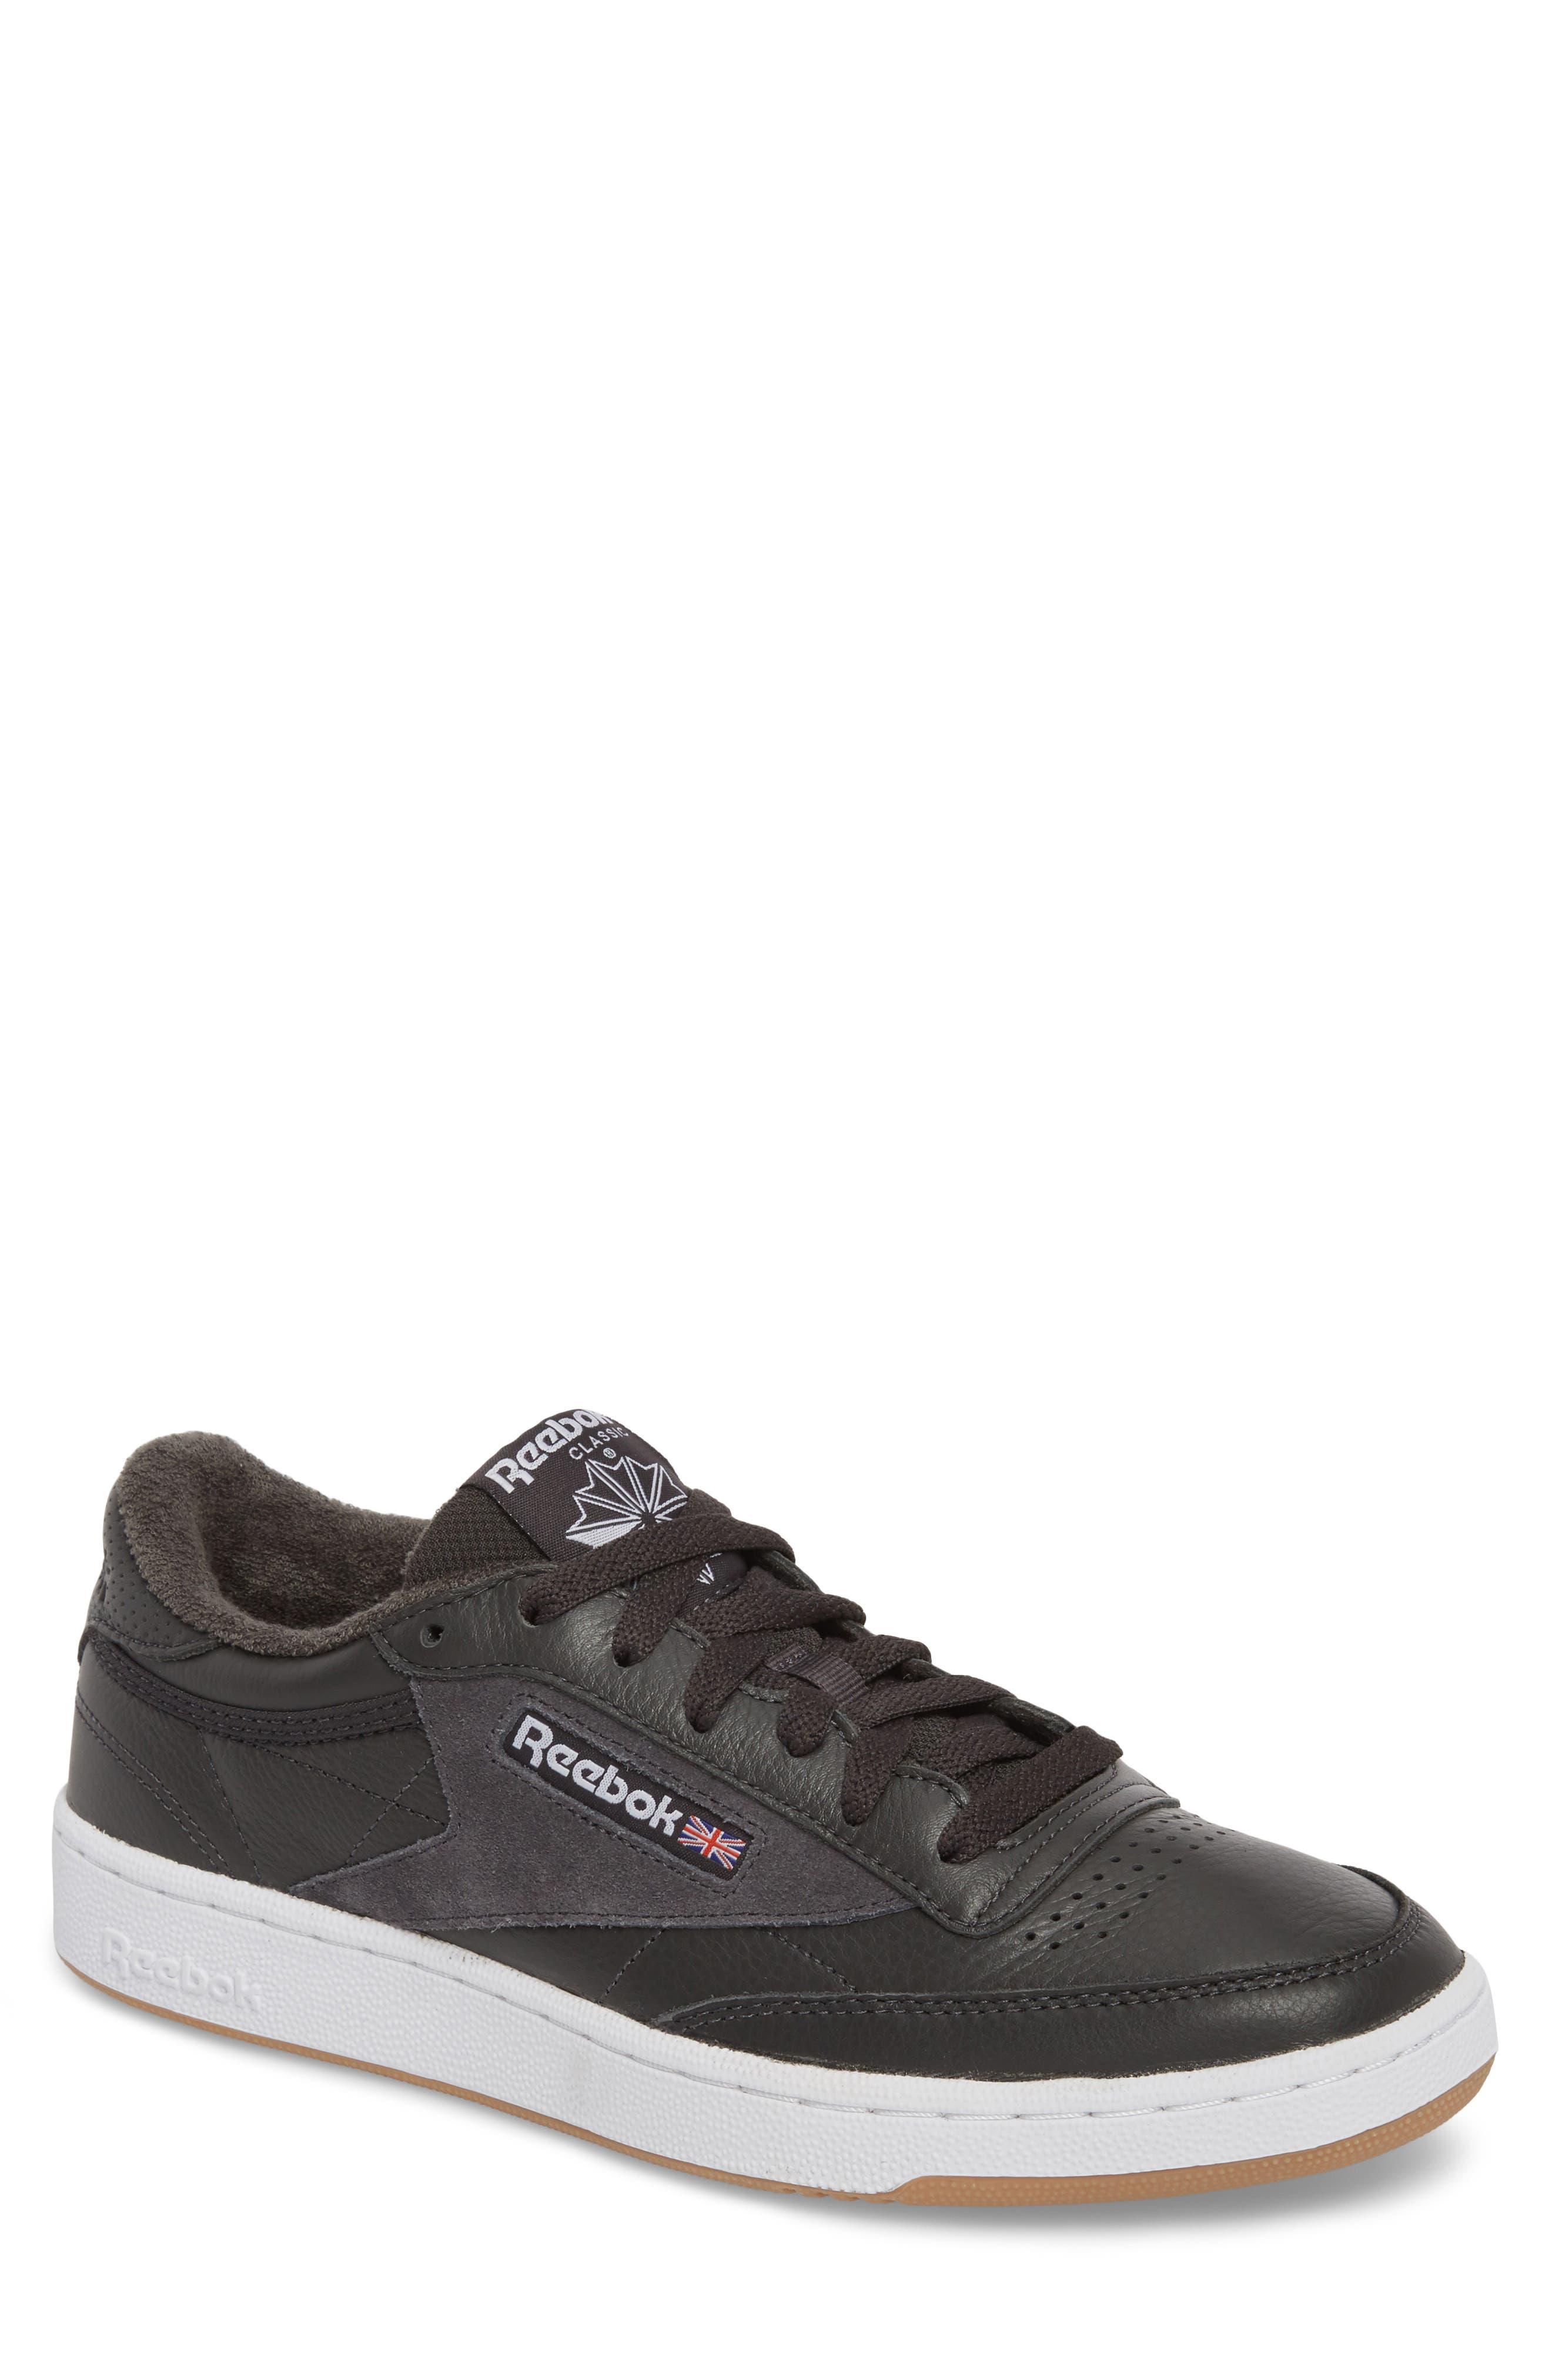 Club C 85 ESTL Sneaker,                         Main,                         color, 001